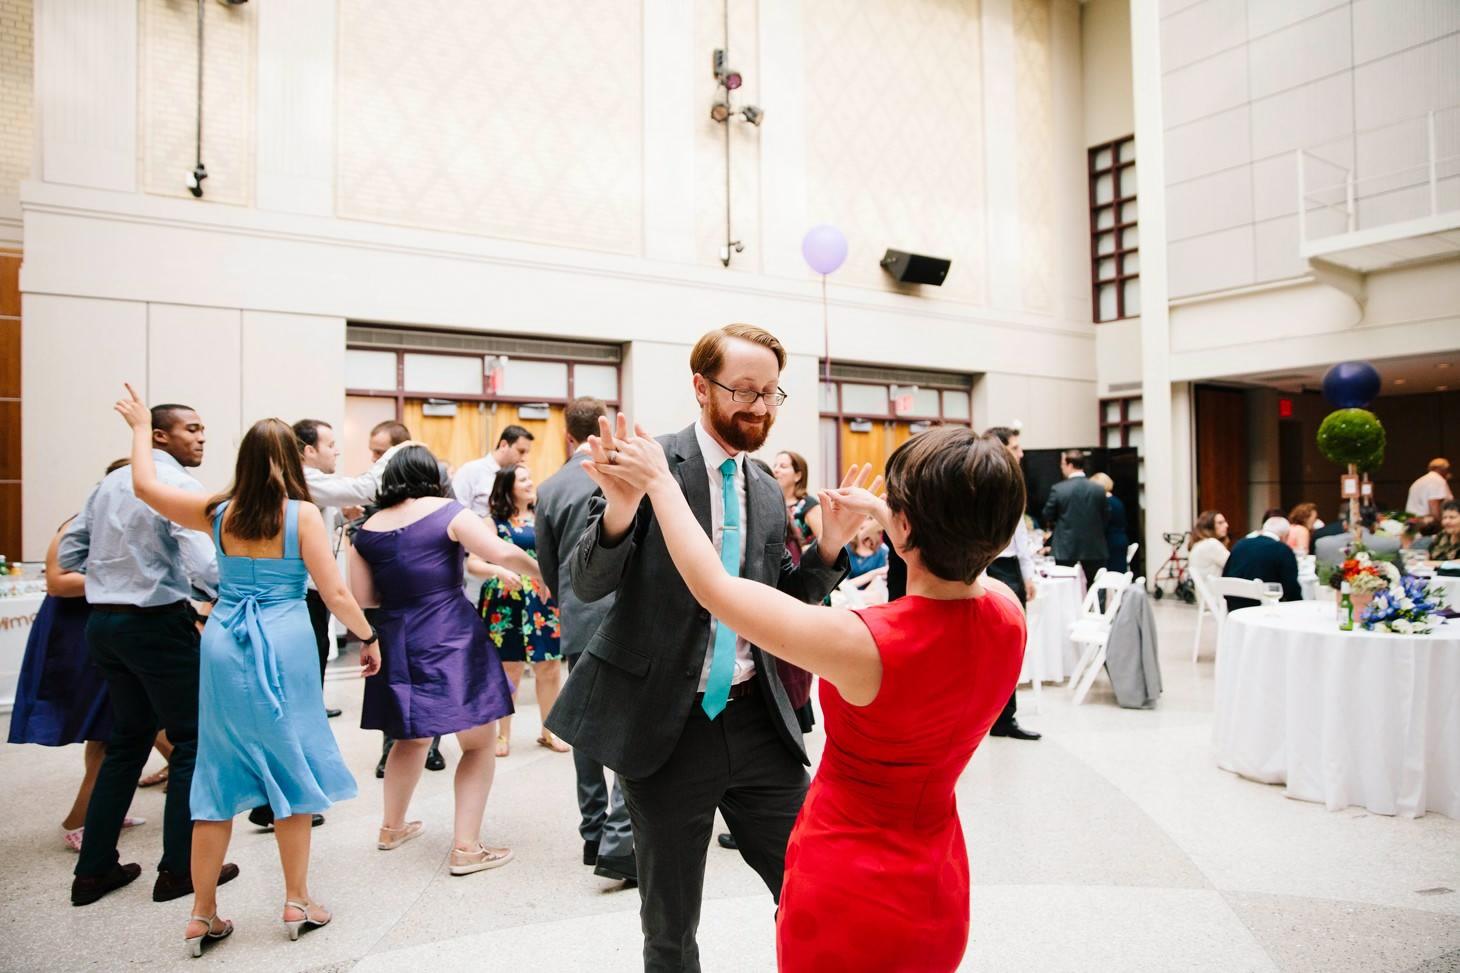 101-nyc-wedding-photographer-hoboken-waterfront-wedding-photos-smitten-chickens.jpg